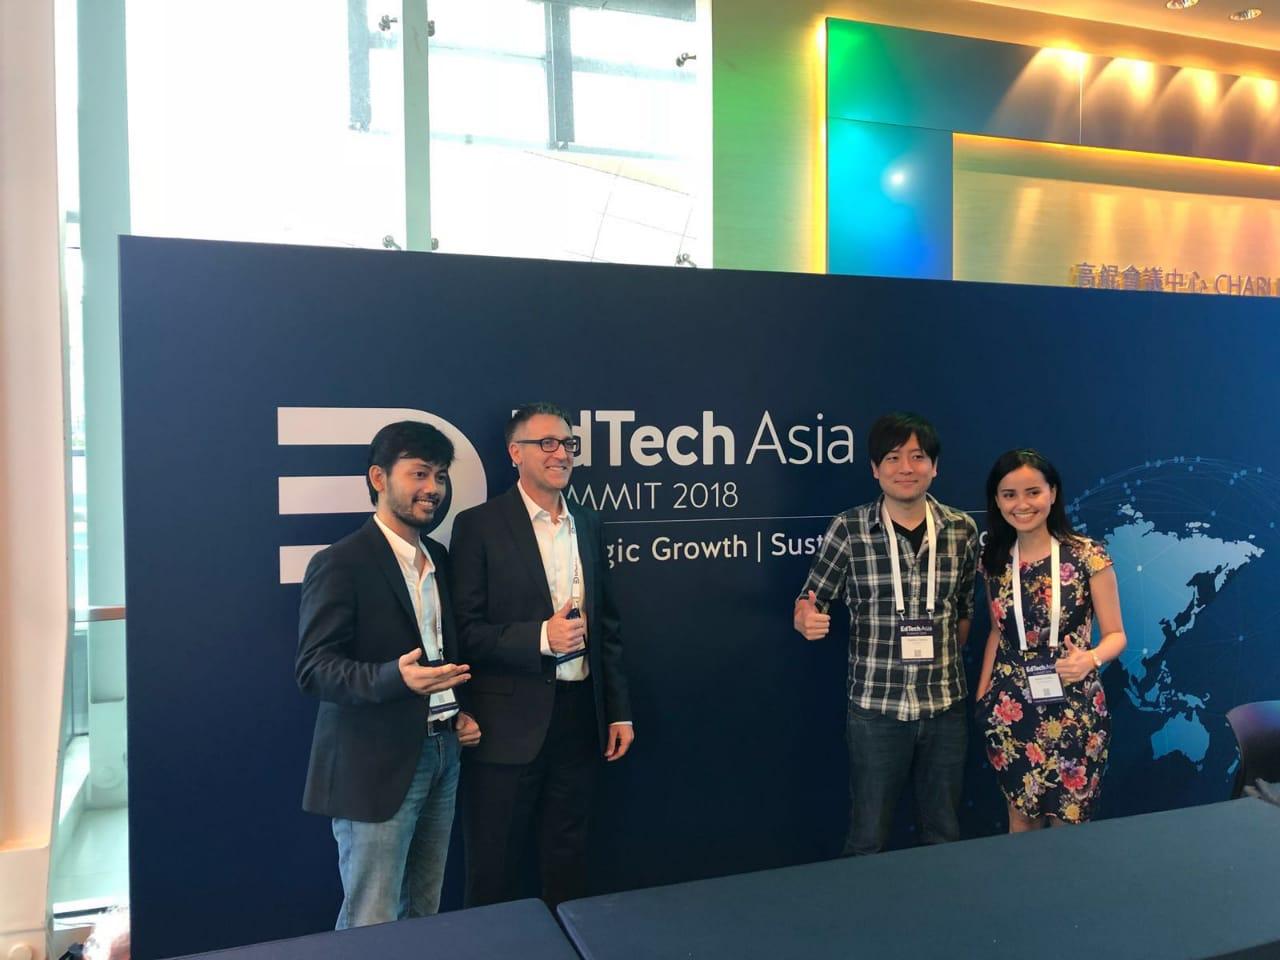 Hadir dalam Edtech Asia Summit, Quipper Bahas Tantangan Dunia Pendidikan